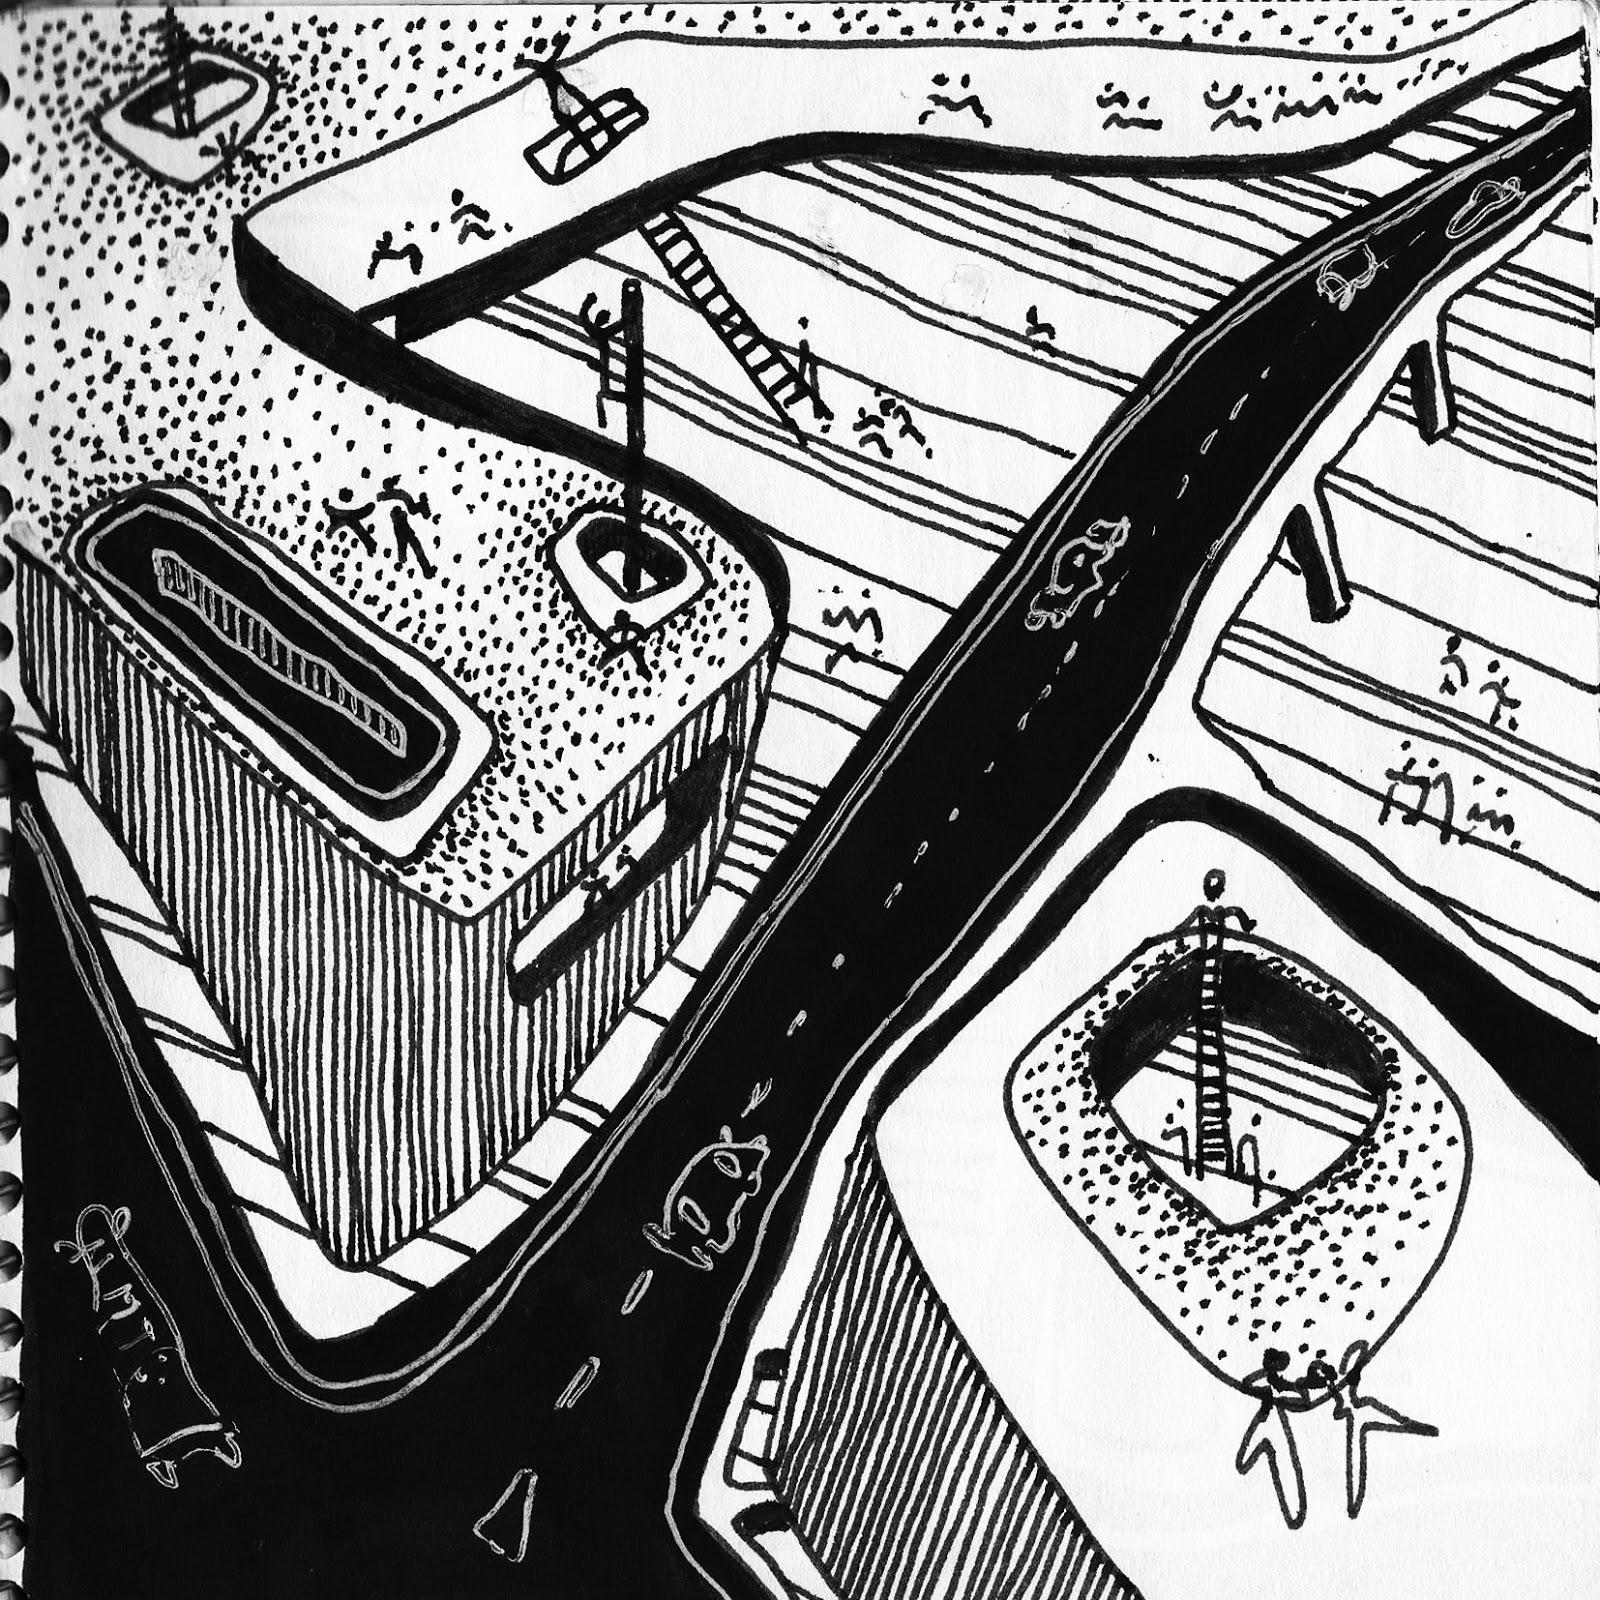 Jesus Huarte Territorio De Arquitectura Dibujos Blanco Y Negro